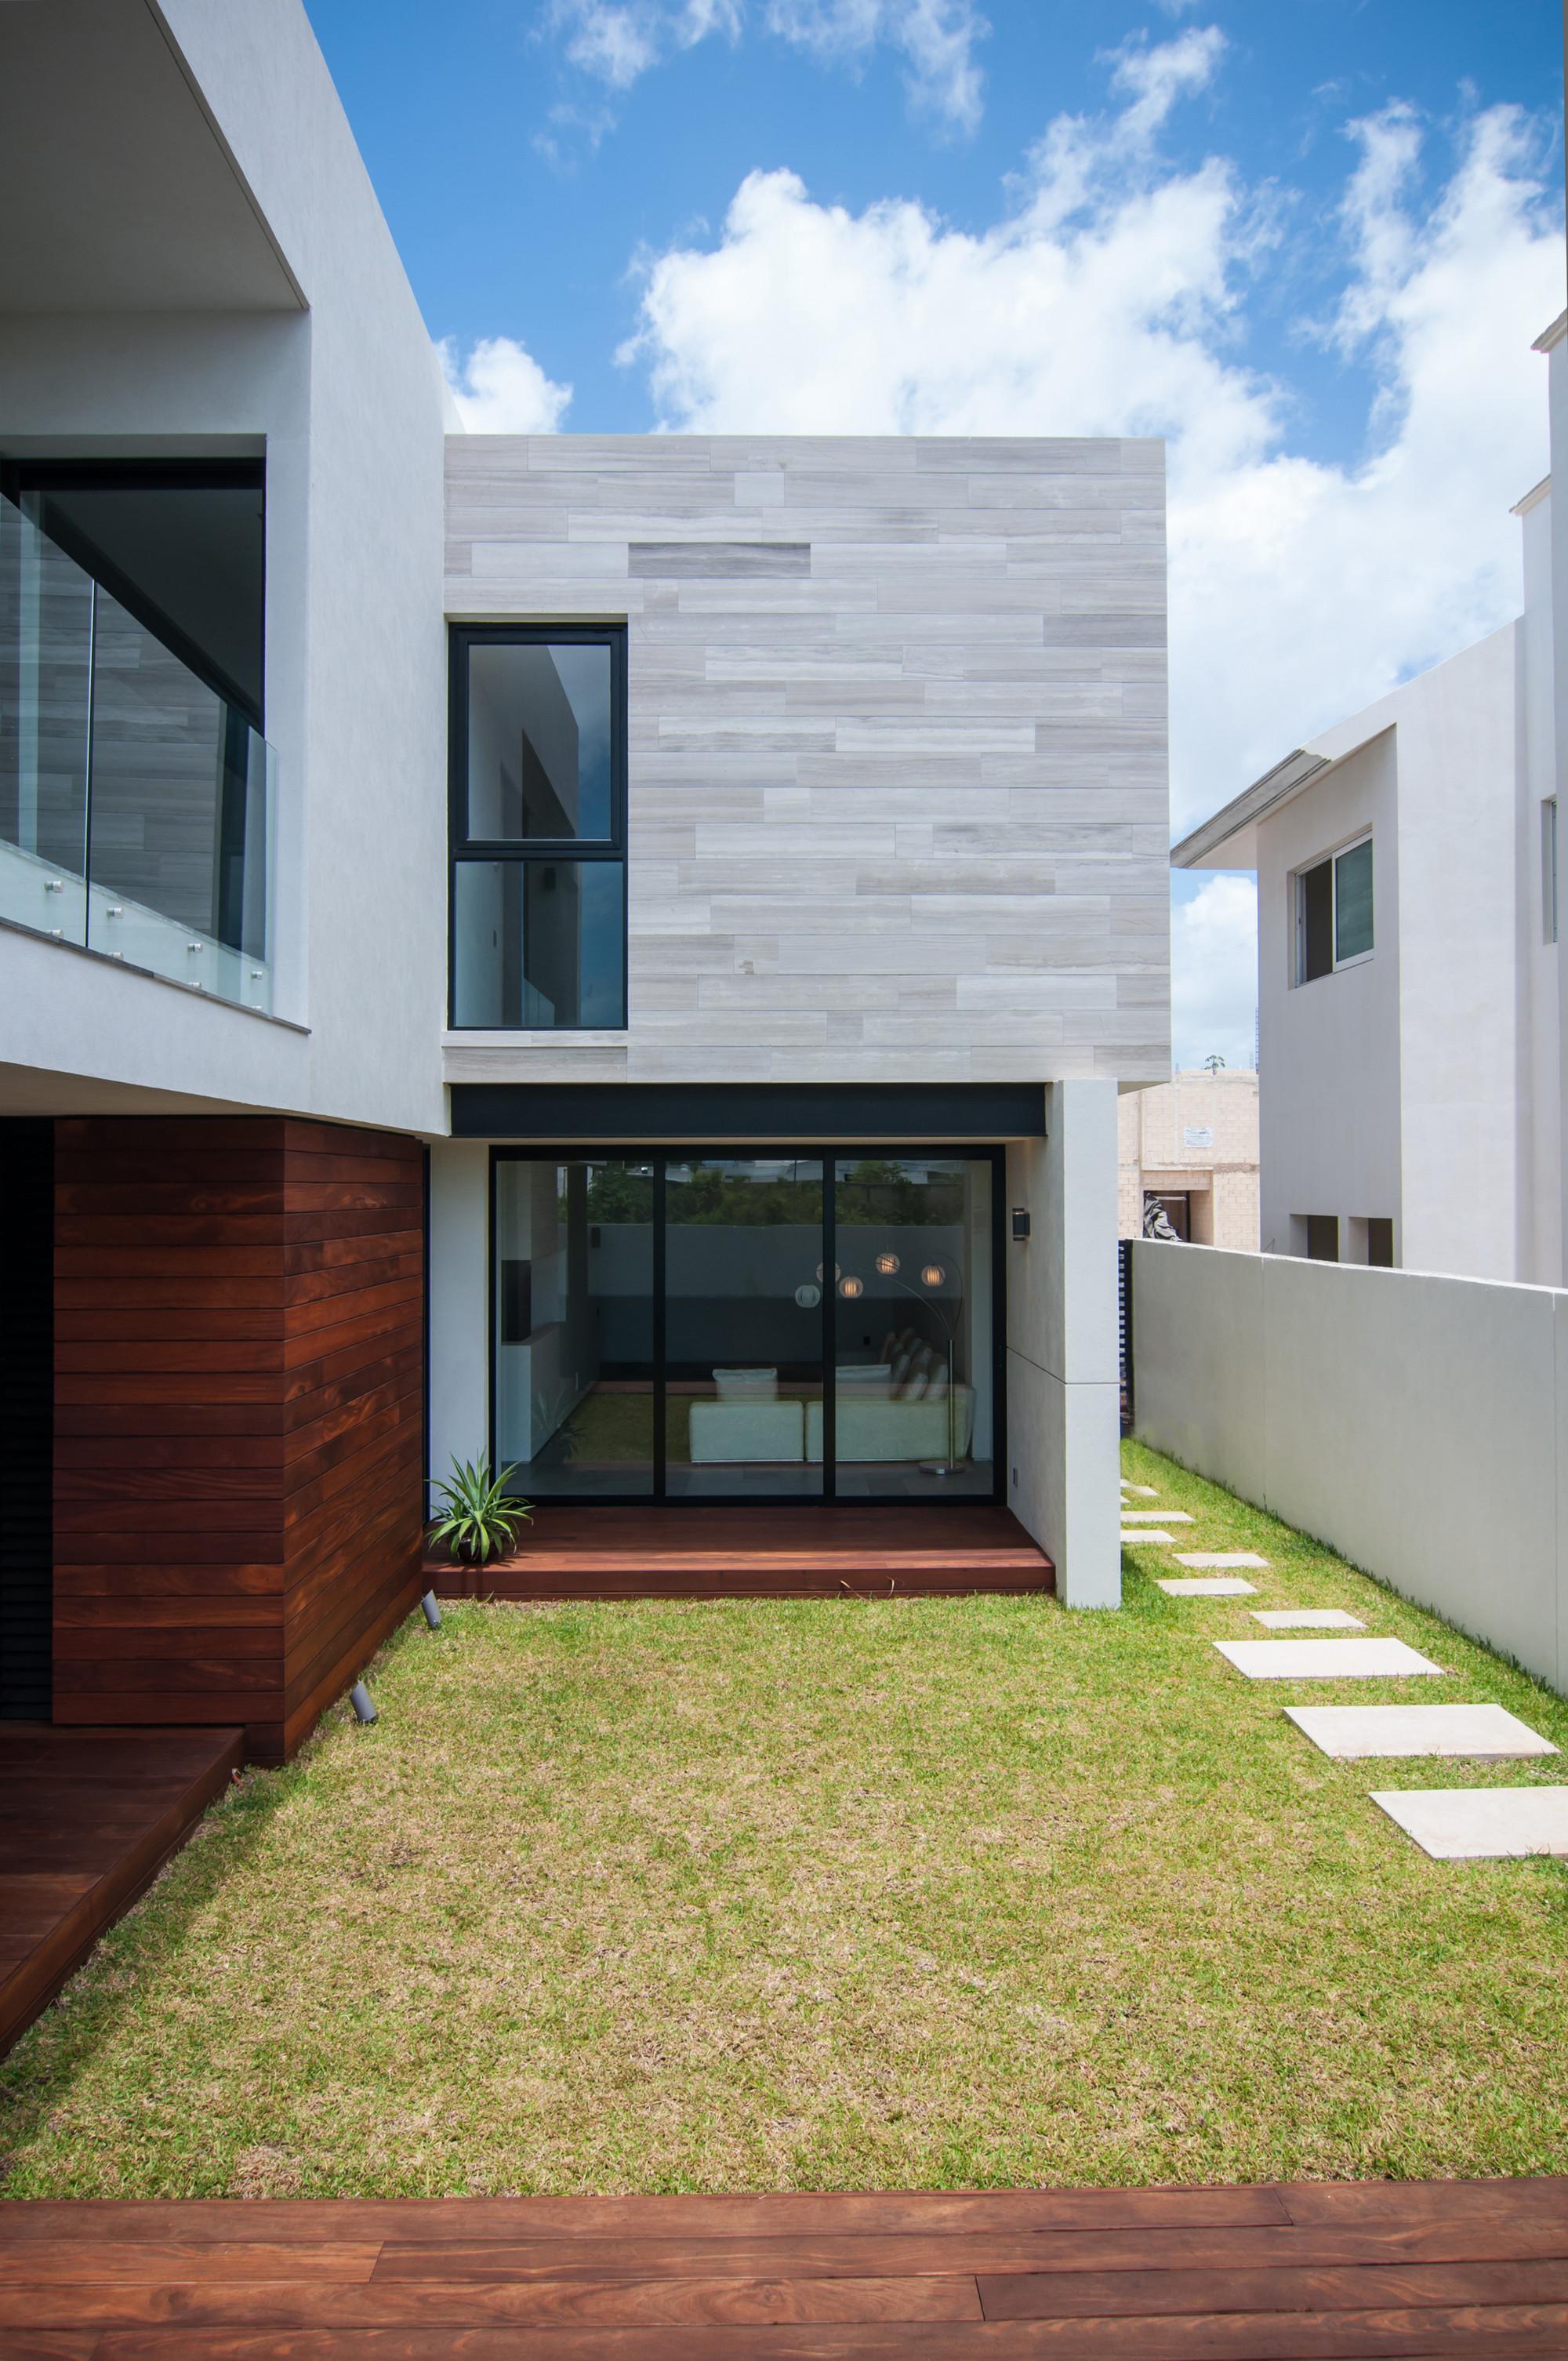 Galer a de casa paracaima taff arquitectos 11 for Casas minimalistas 180m2